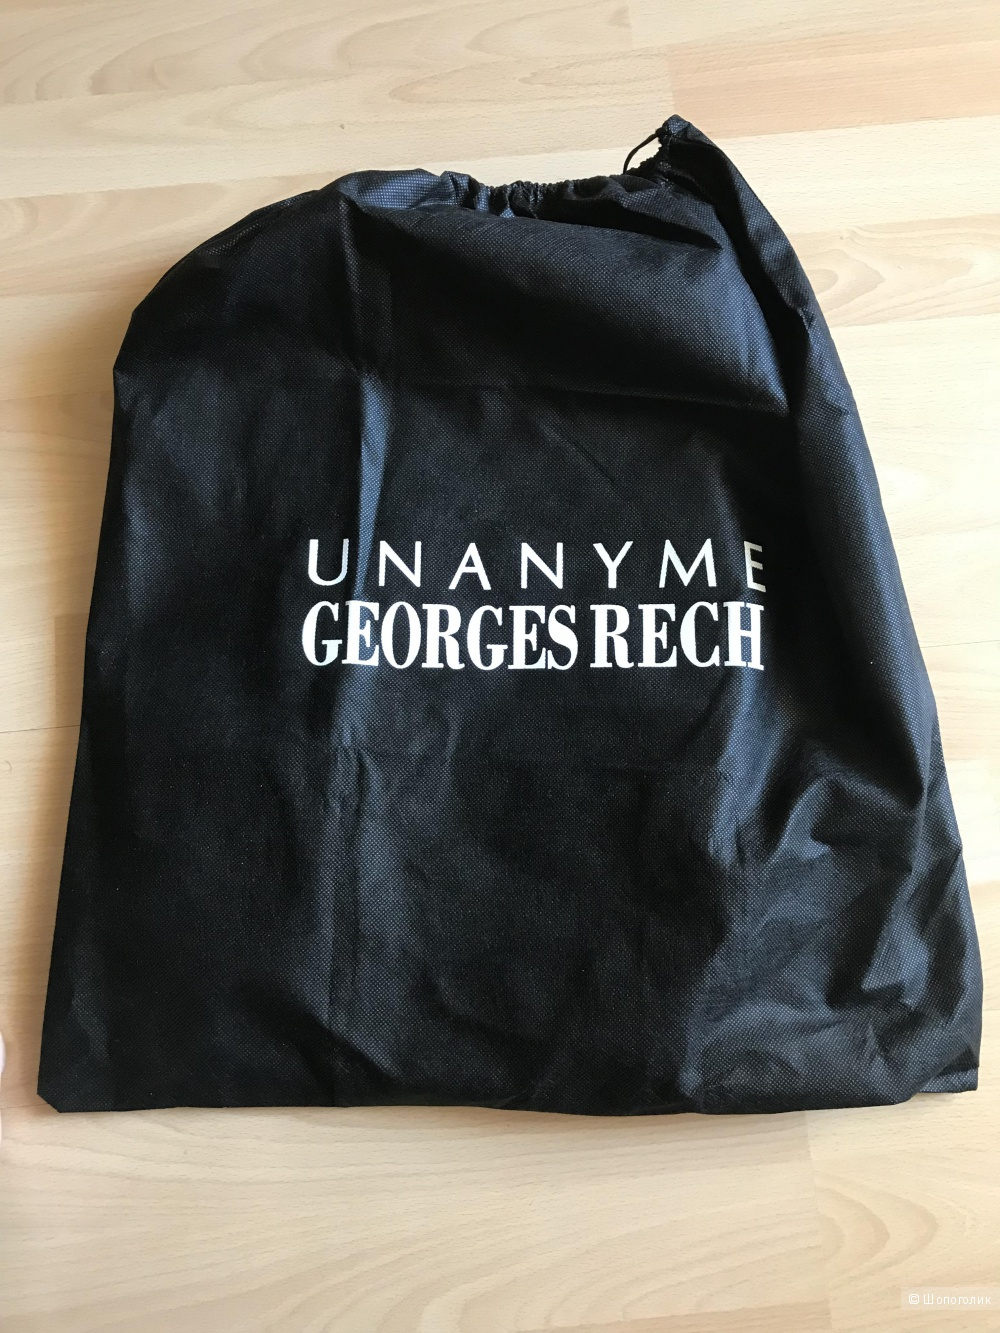 Кожаная сумка UNANYME DE GEORGES RECH